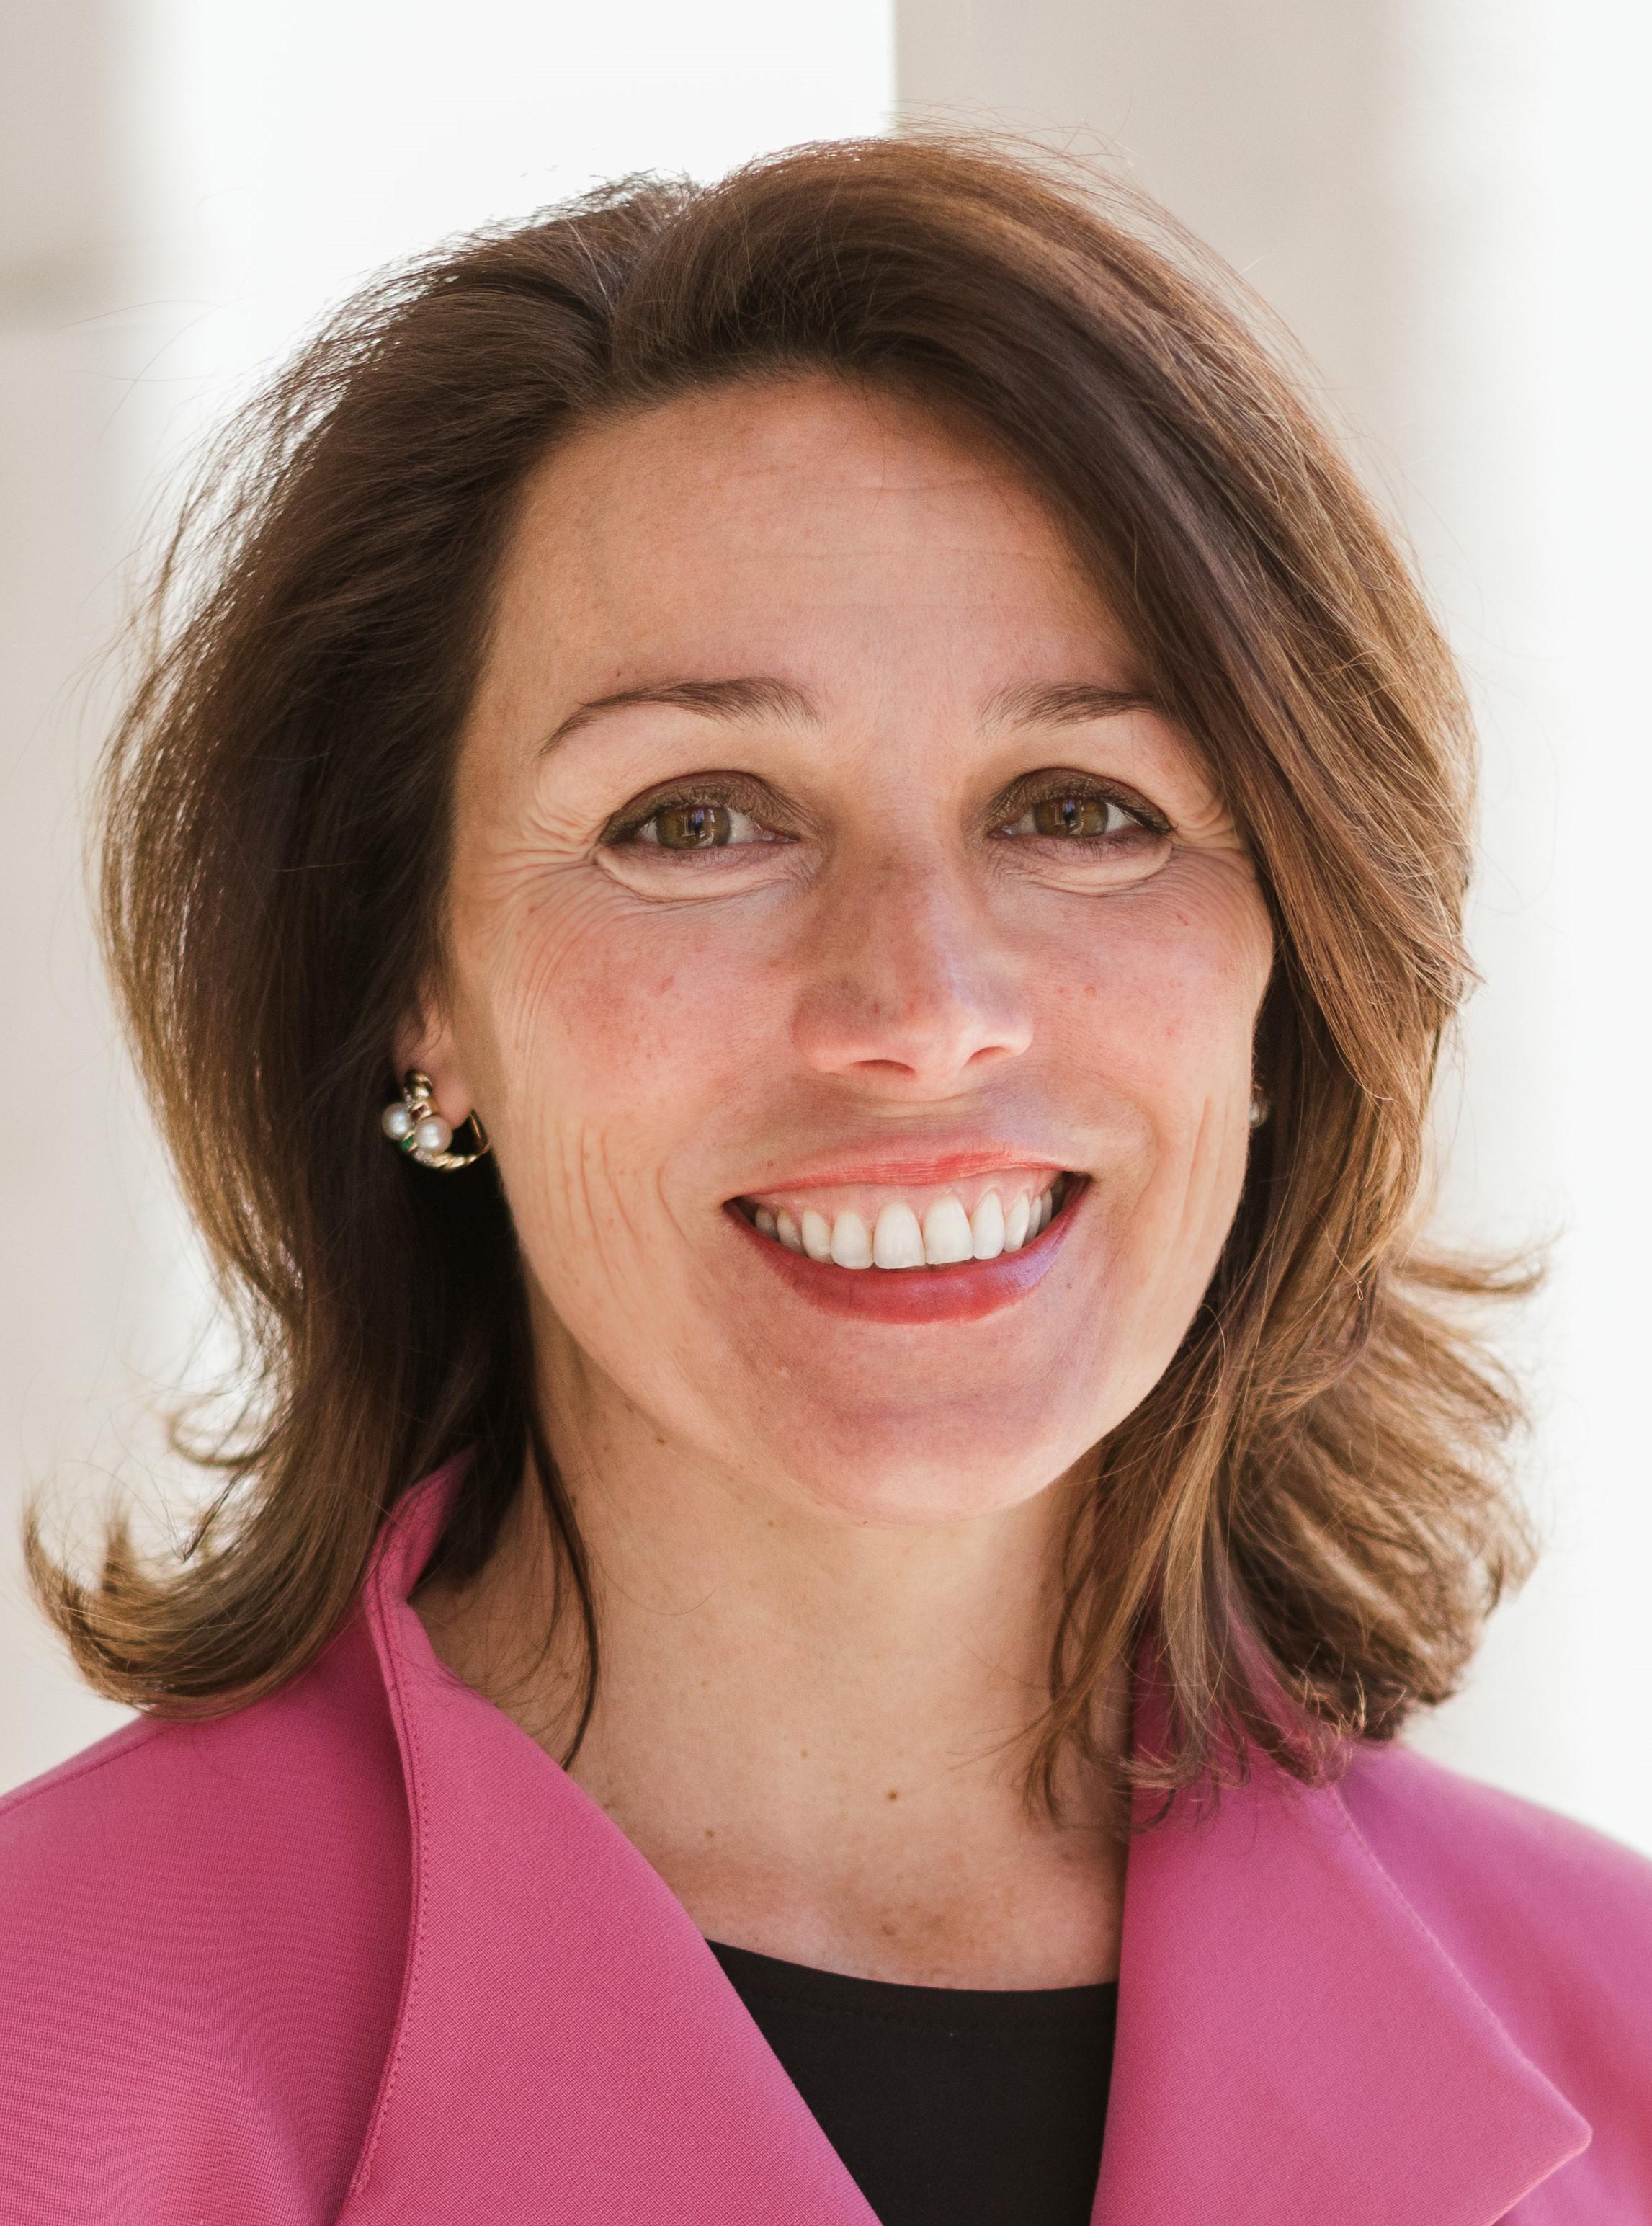 Dr. Alexa Chilcutt